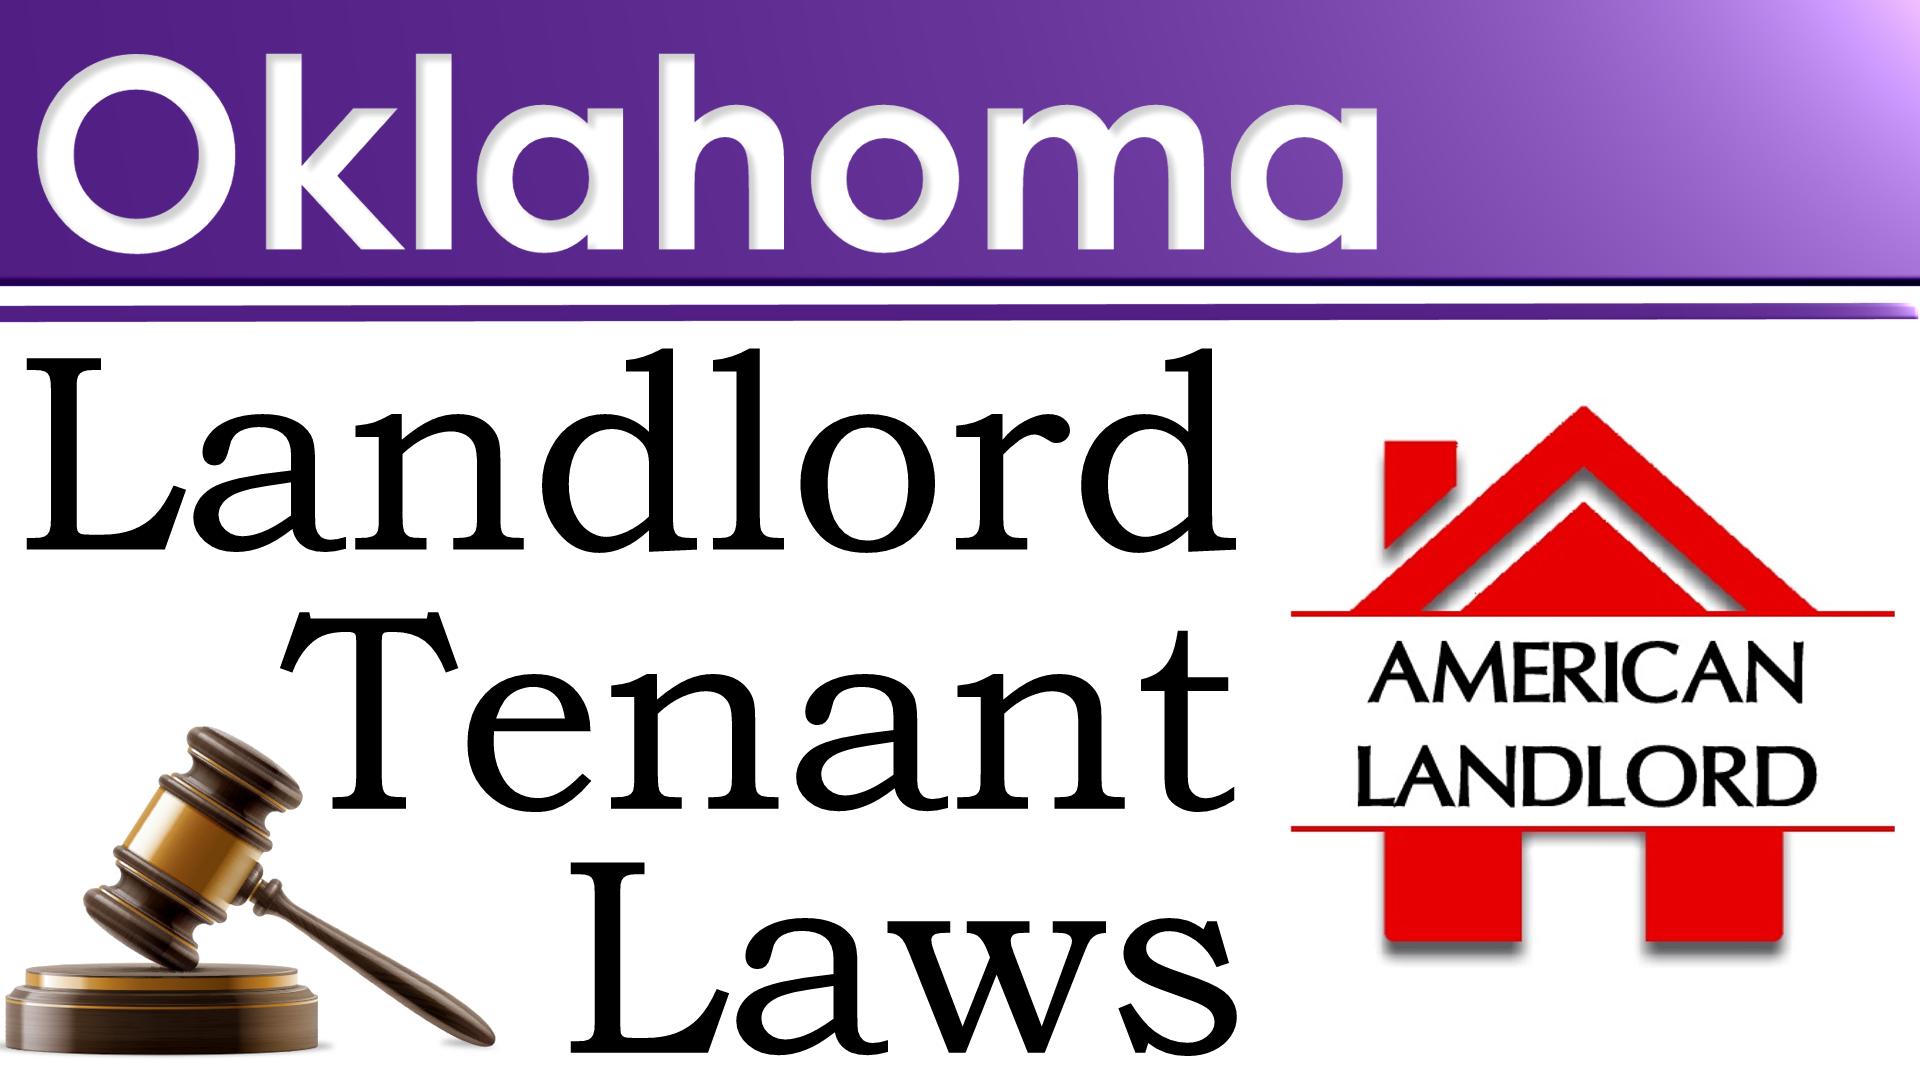 Oklahoma landlord tenant law